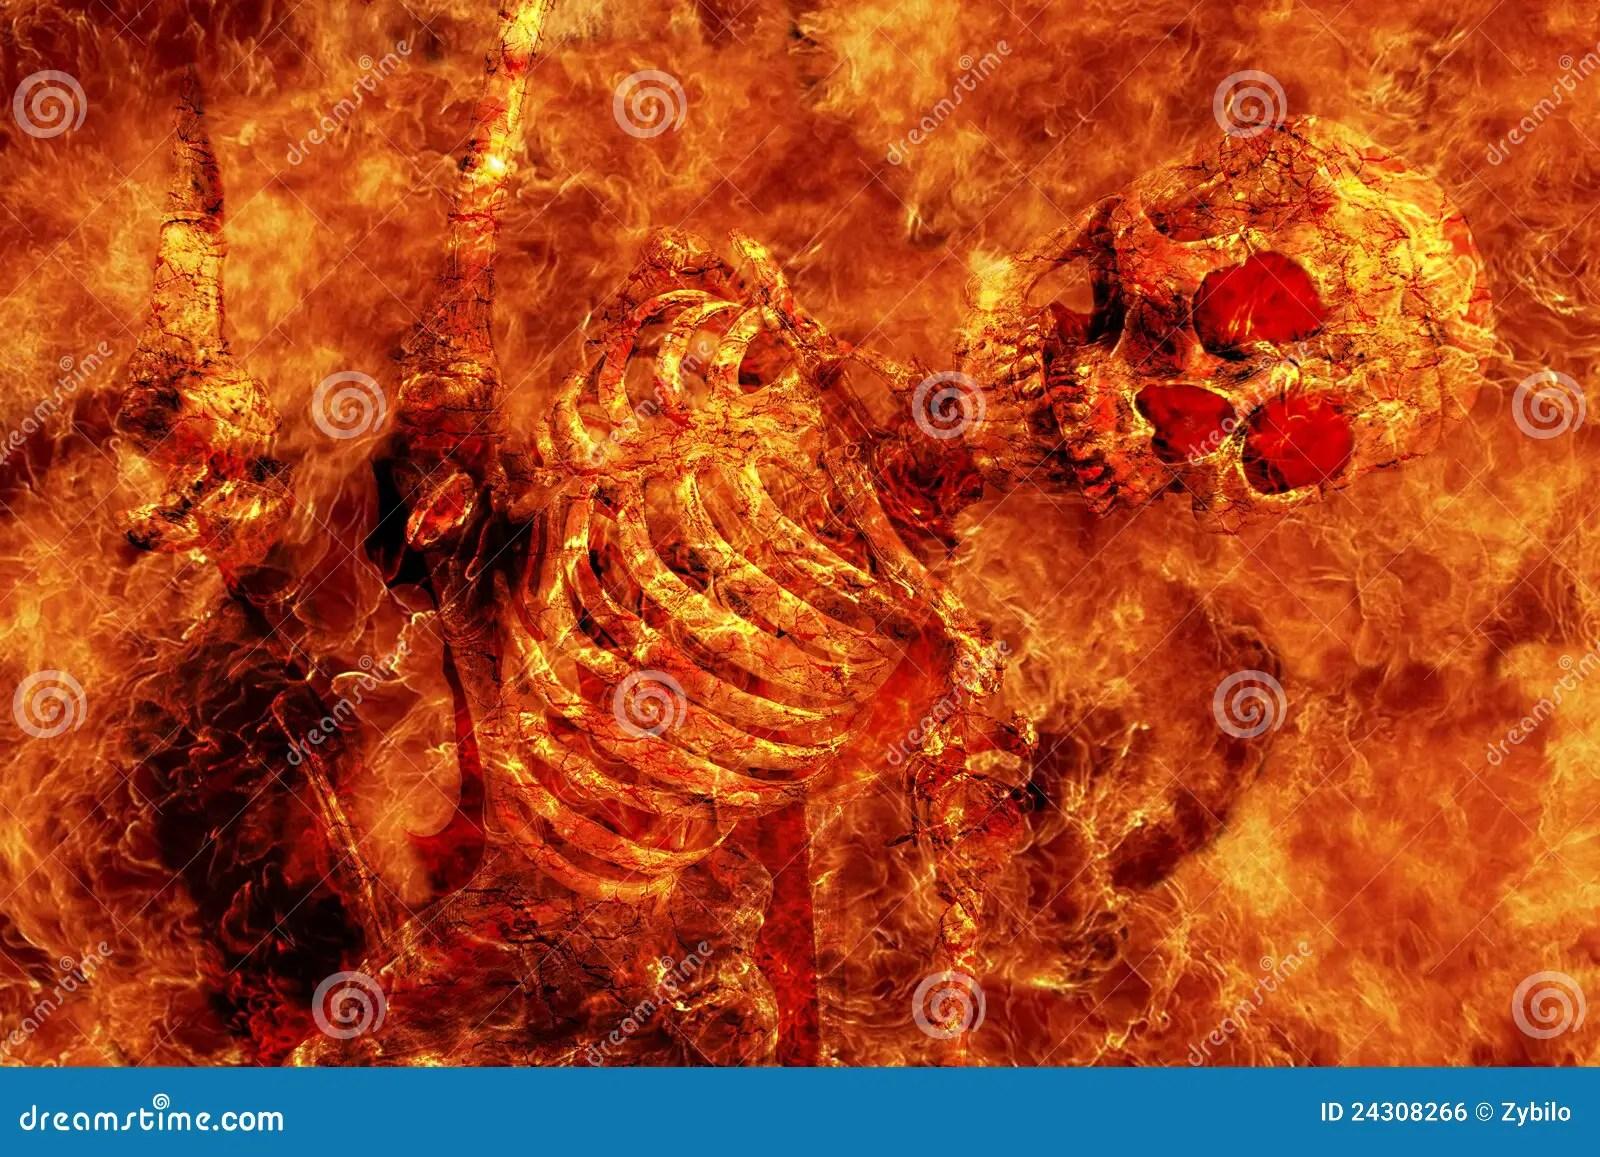 Wallpaper Hd Skeleton Fire Skeleton Stock Photo Image Of Hallowen Heat